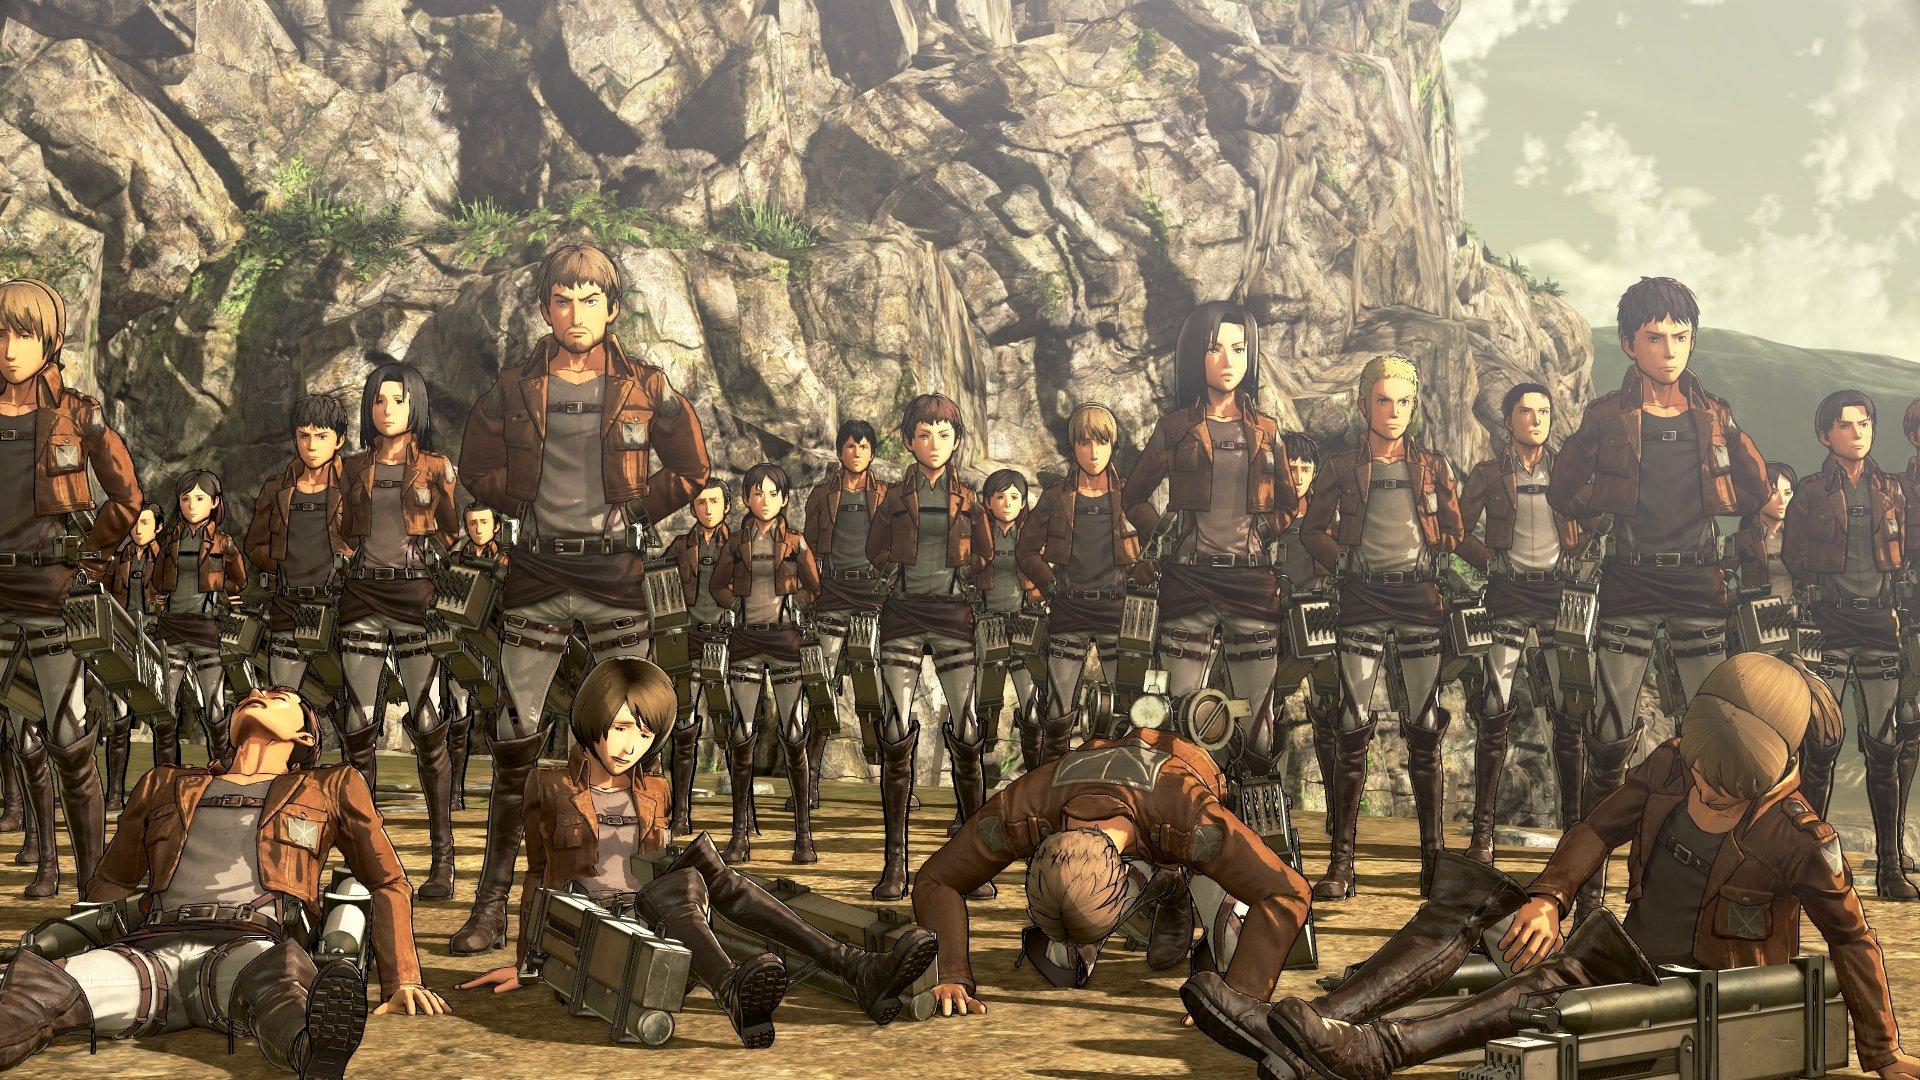 Attack on titan · aot. 4 Attack on Titan: Wings of Freedom Fondos de pantalla HD ...